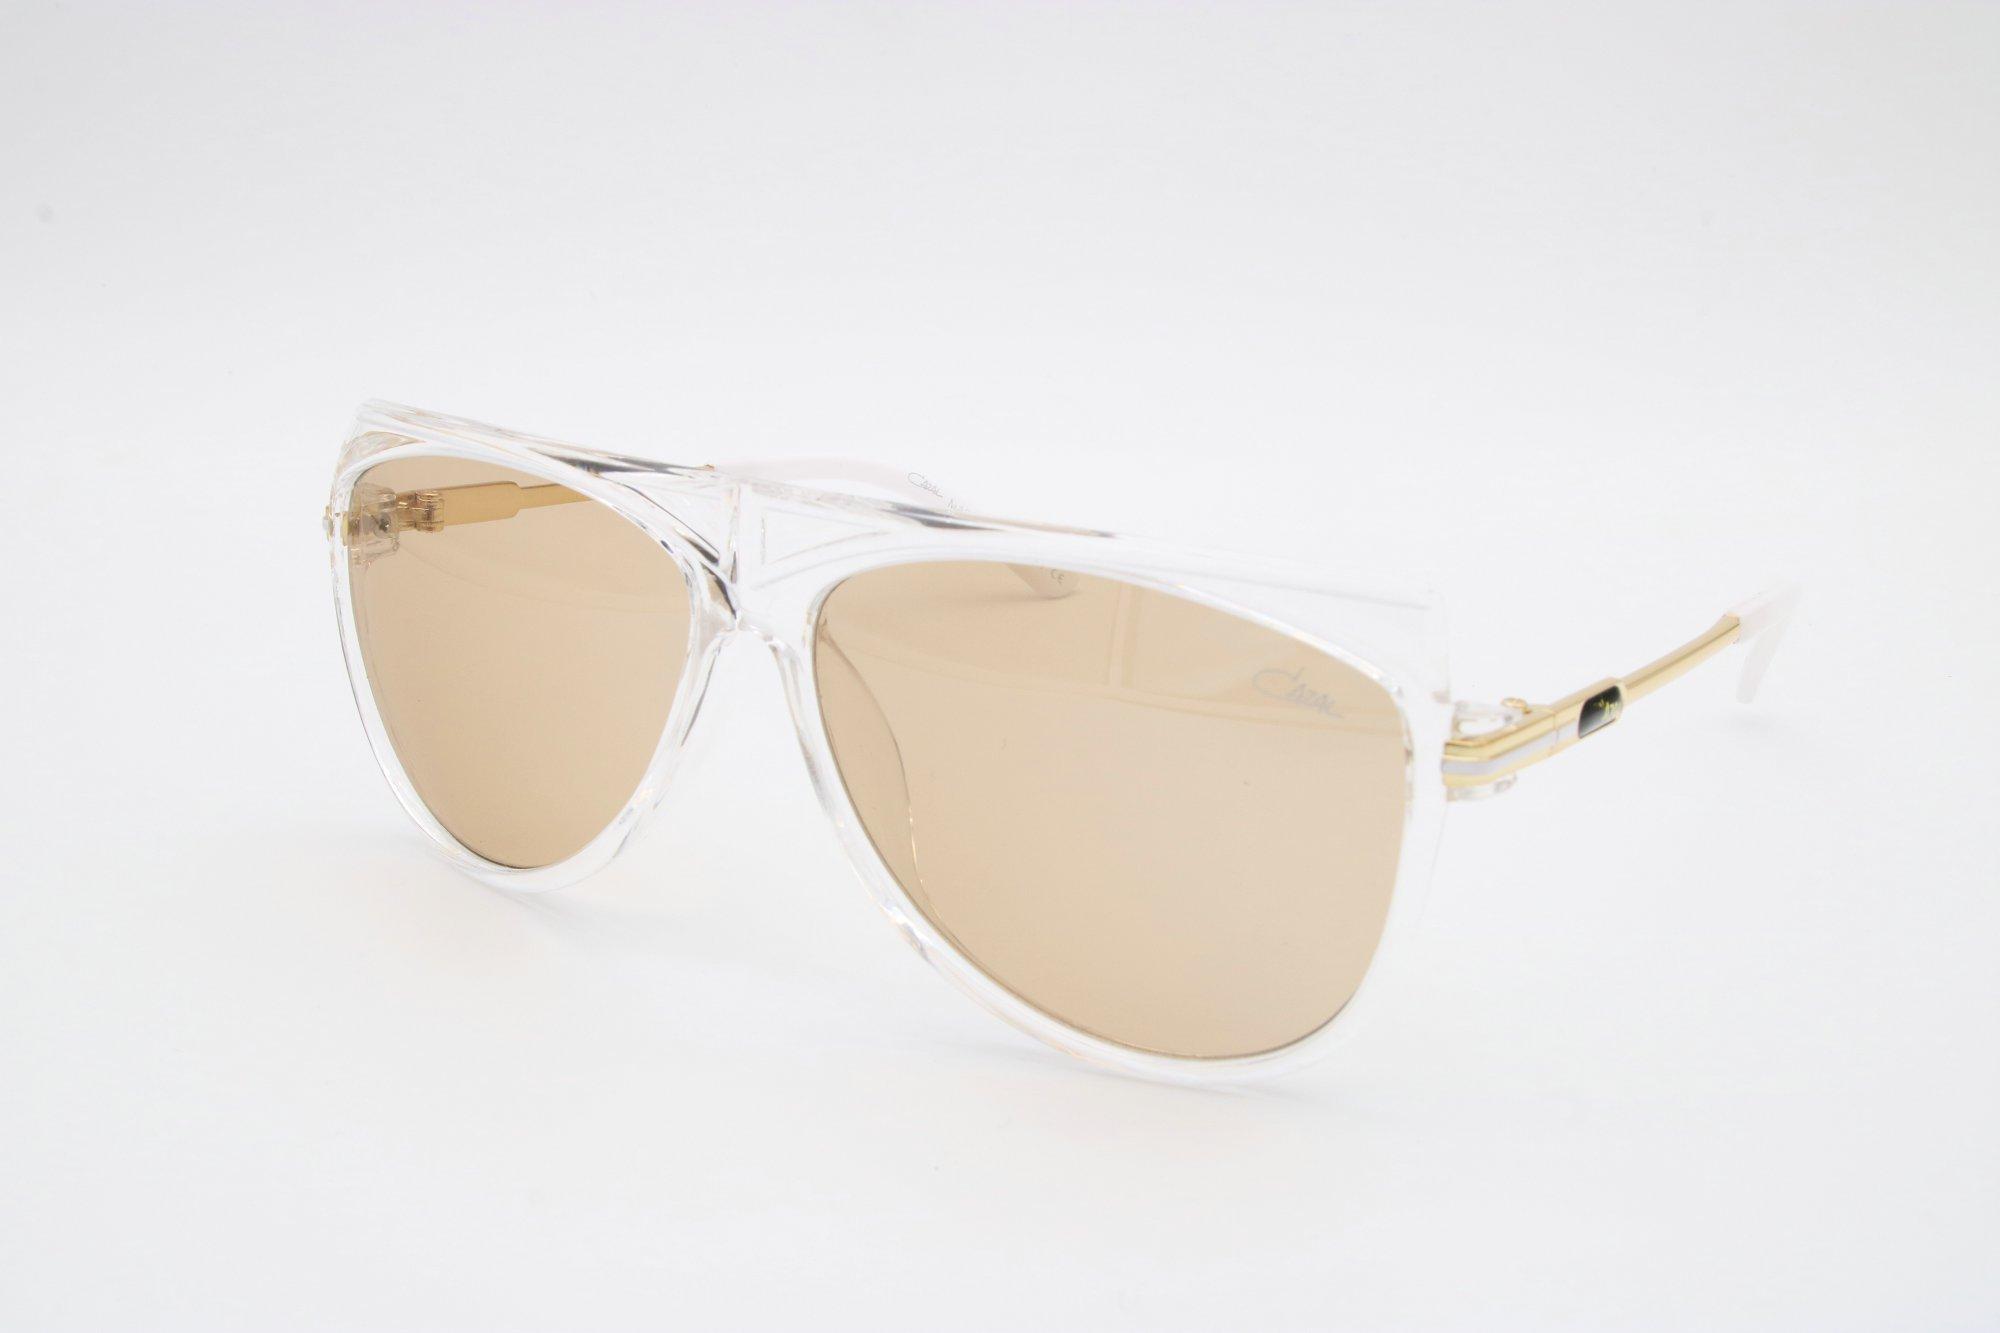 Big Frame Aviator Glasses : Ca Zal Sun Glasses Eyewear 4066 Luxury Polarized Vintage ...